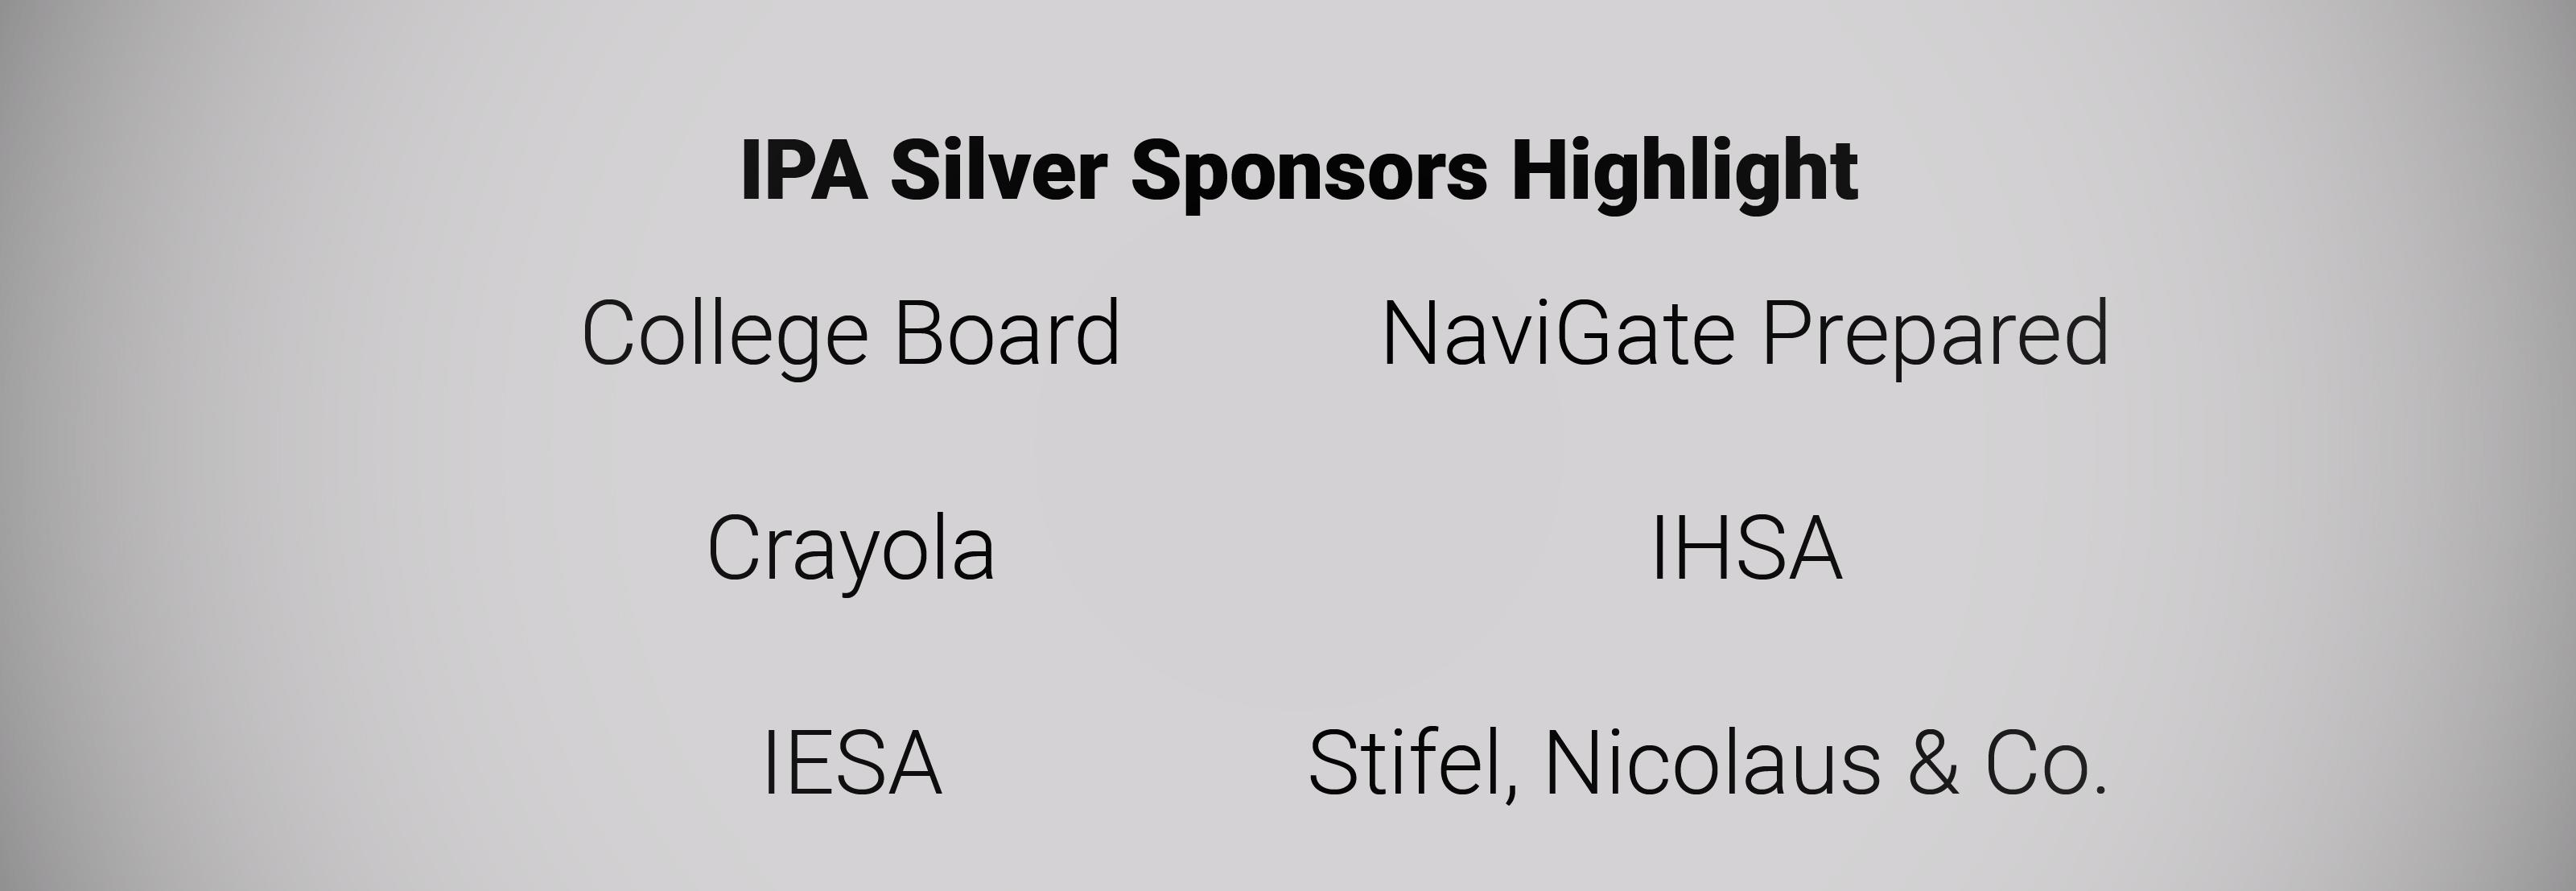 silverSponsors